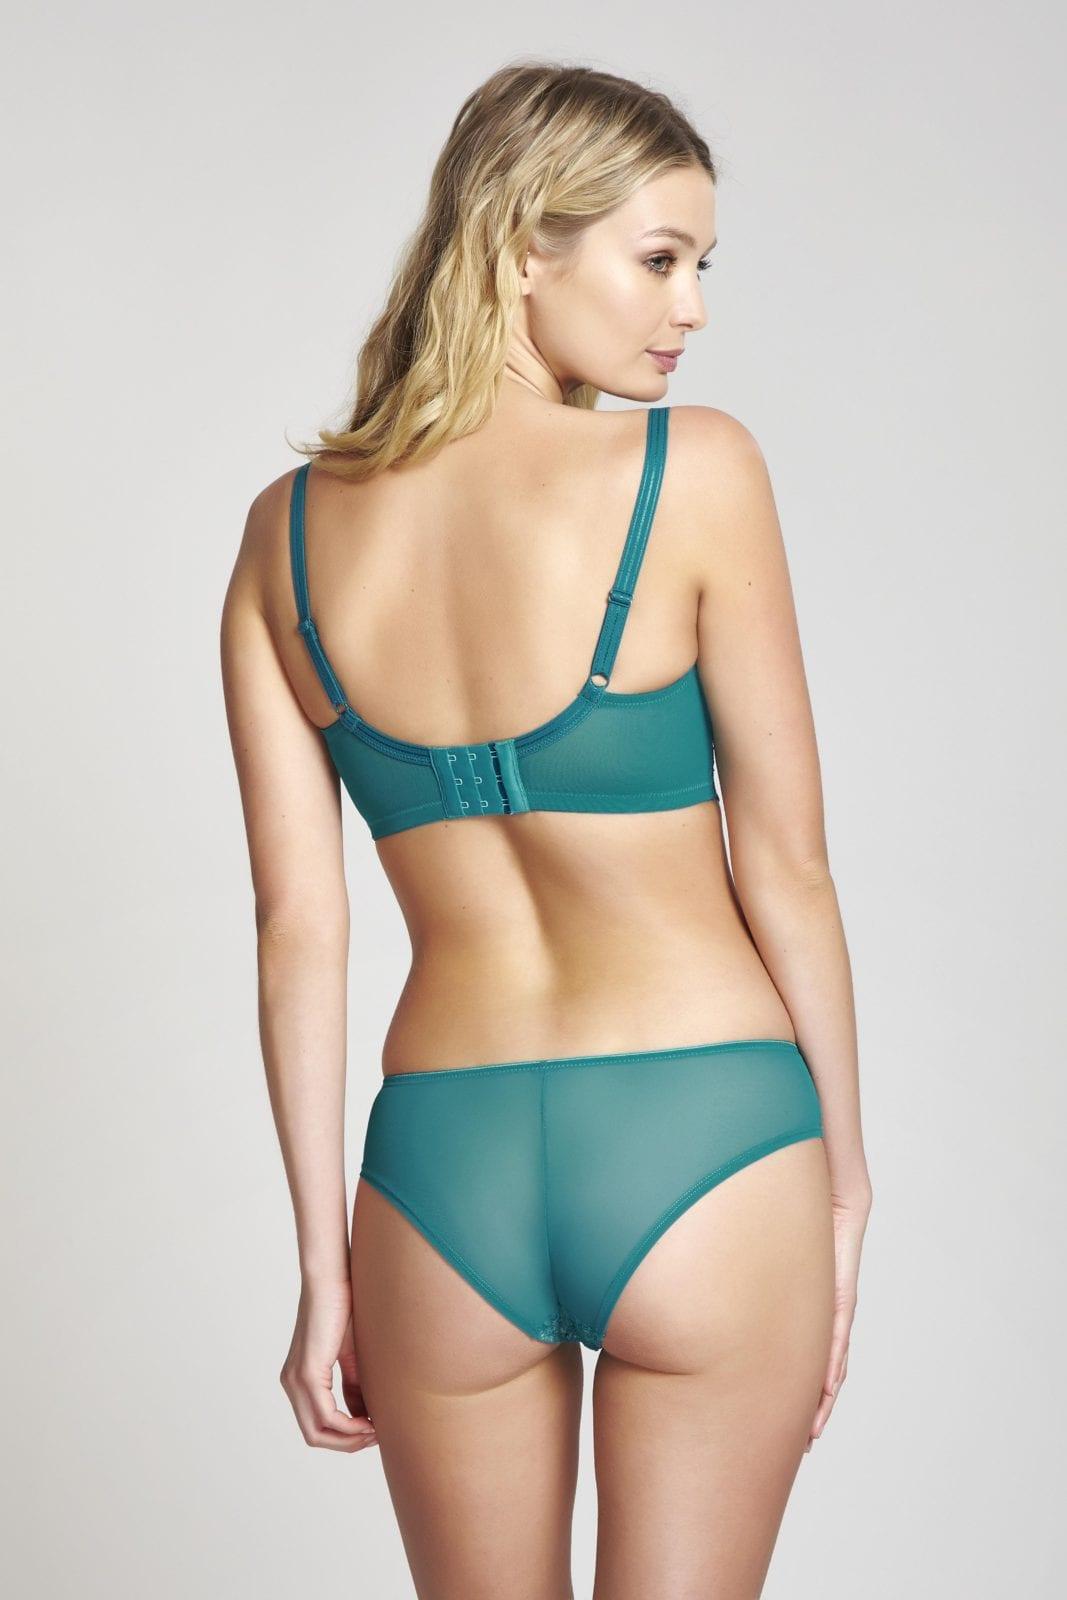 Бюстгальтеры 9357_845_Piper Midi Balconnet Bra Emerald Nude Back Trade 4-min